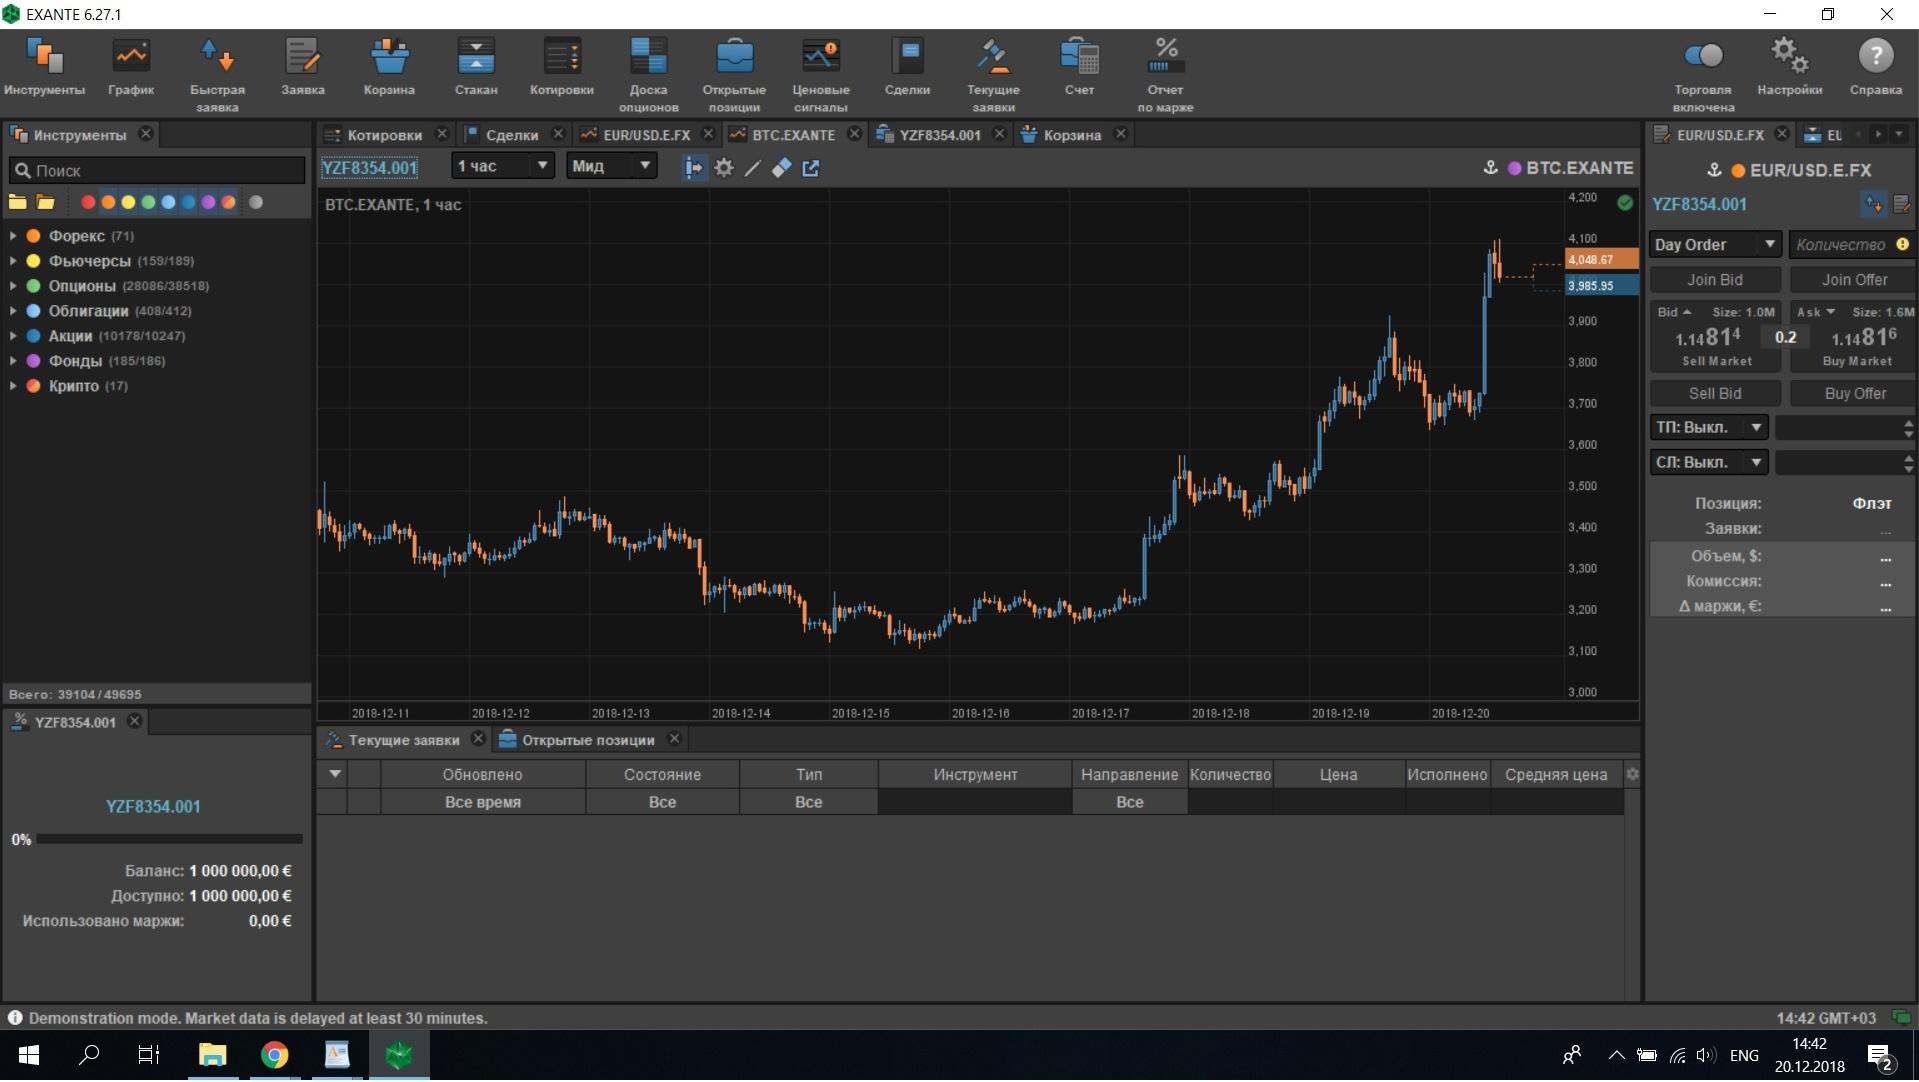 EXANTE Investment Company Review | Finance | ihodl com